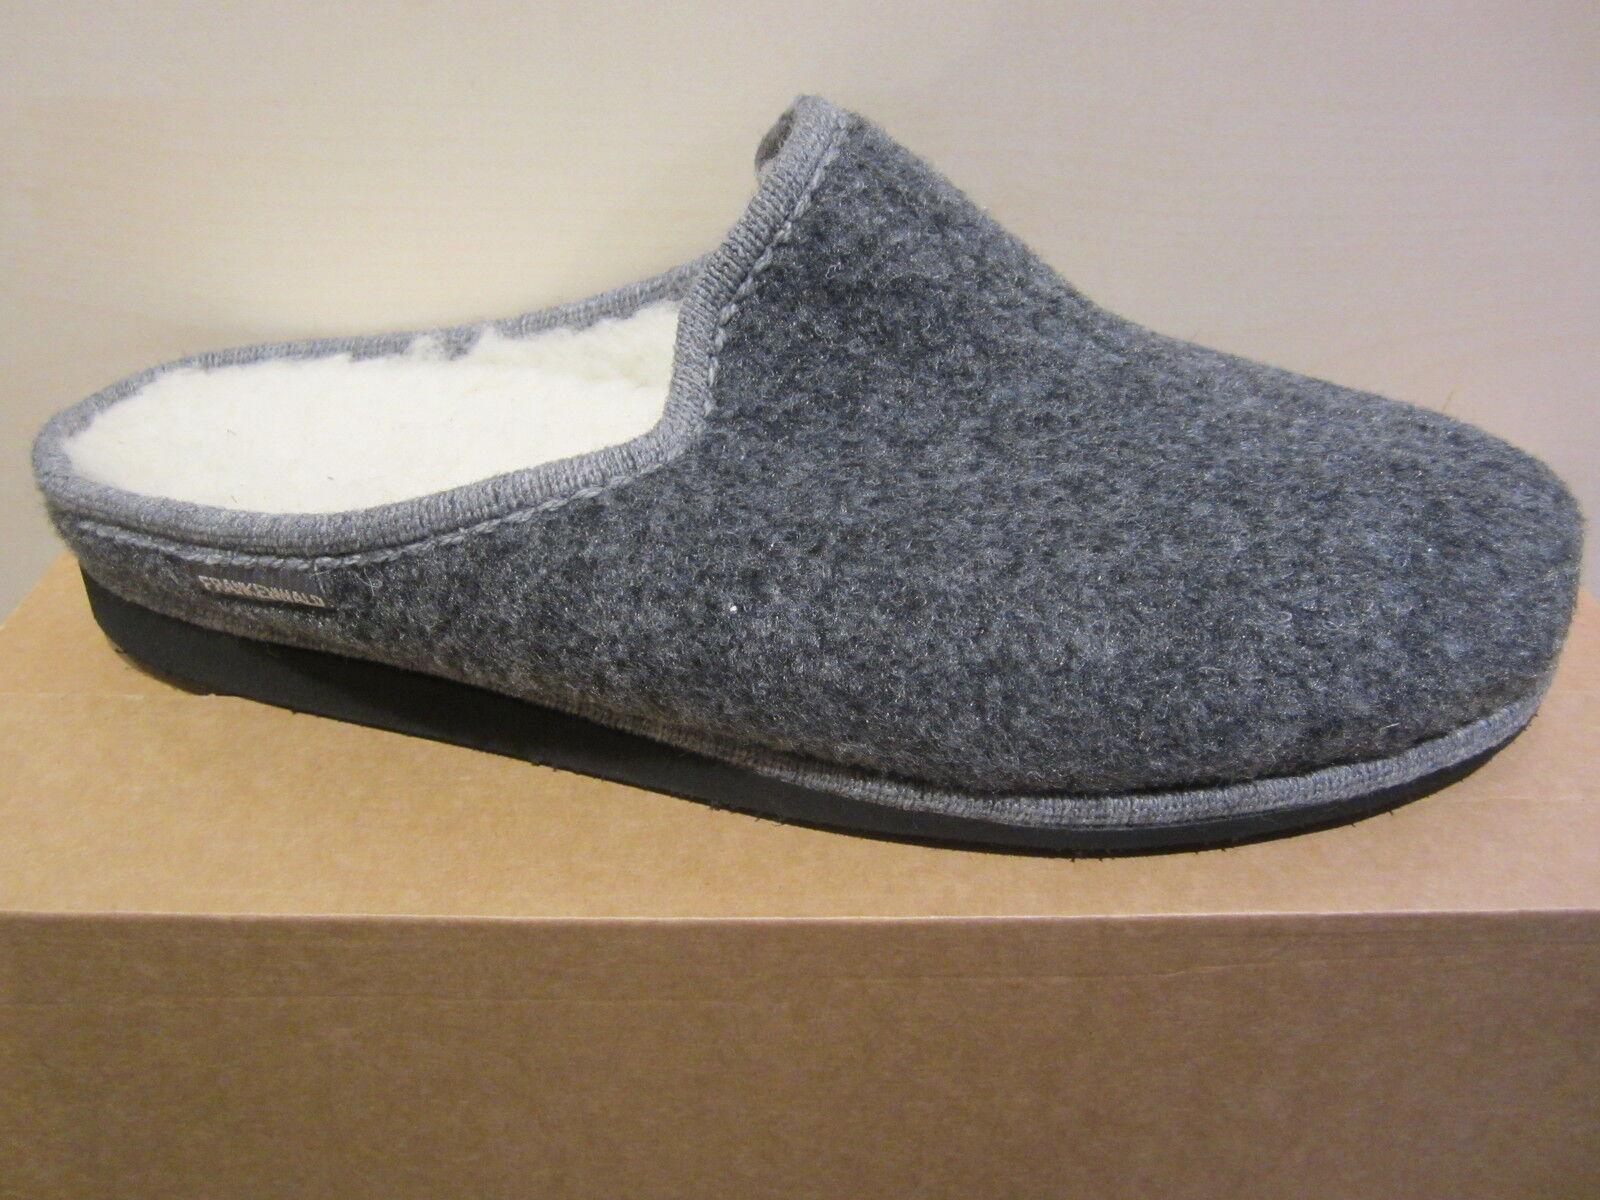 Frankenwald Men's  Slipper, Real Felt, Virgin Wool Lining, grigio, Footled New  liquidazione